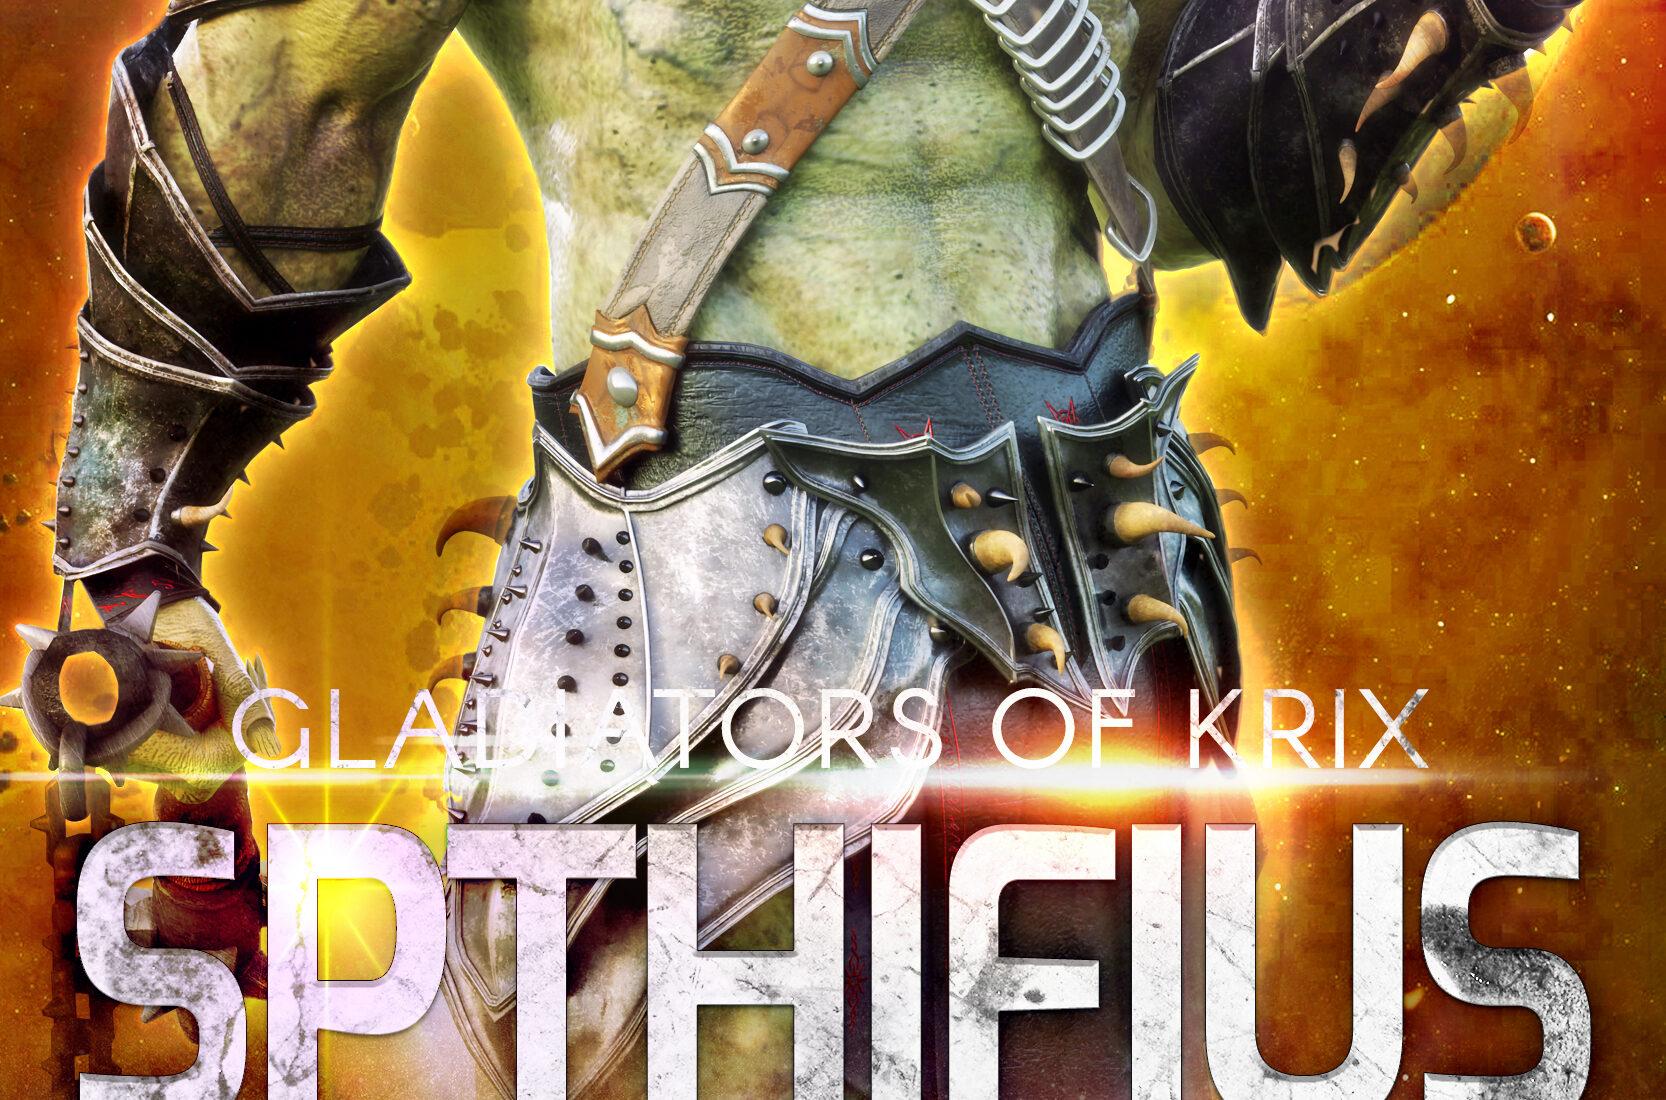 Cover for Spthifius: A SciFi Alien Gladiator Romance (Gladiators of Krix)